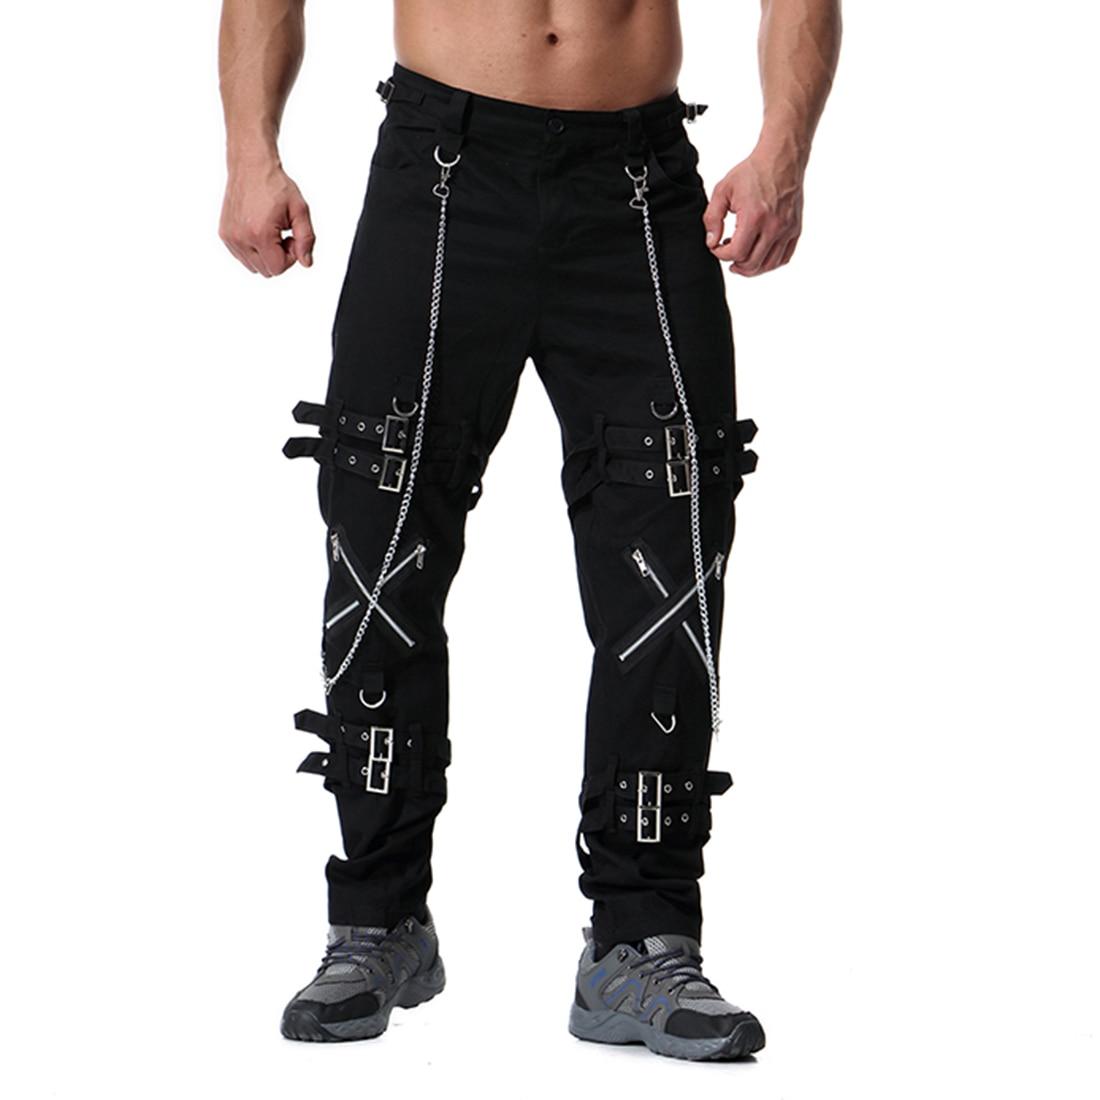 Muti Zippers Men's Cargo Pants Baggy Casual Fitness Men Joggers Sweatpants Trousers 2020 Summer Streetwear Mens Joggers Pants